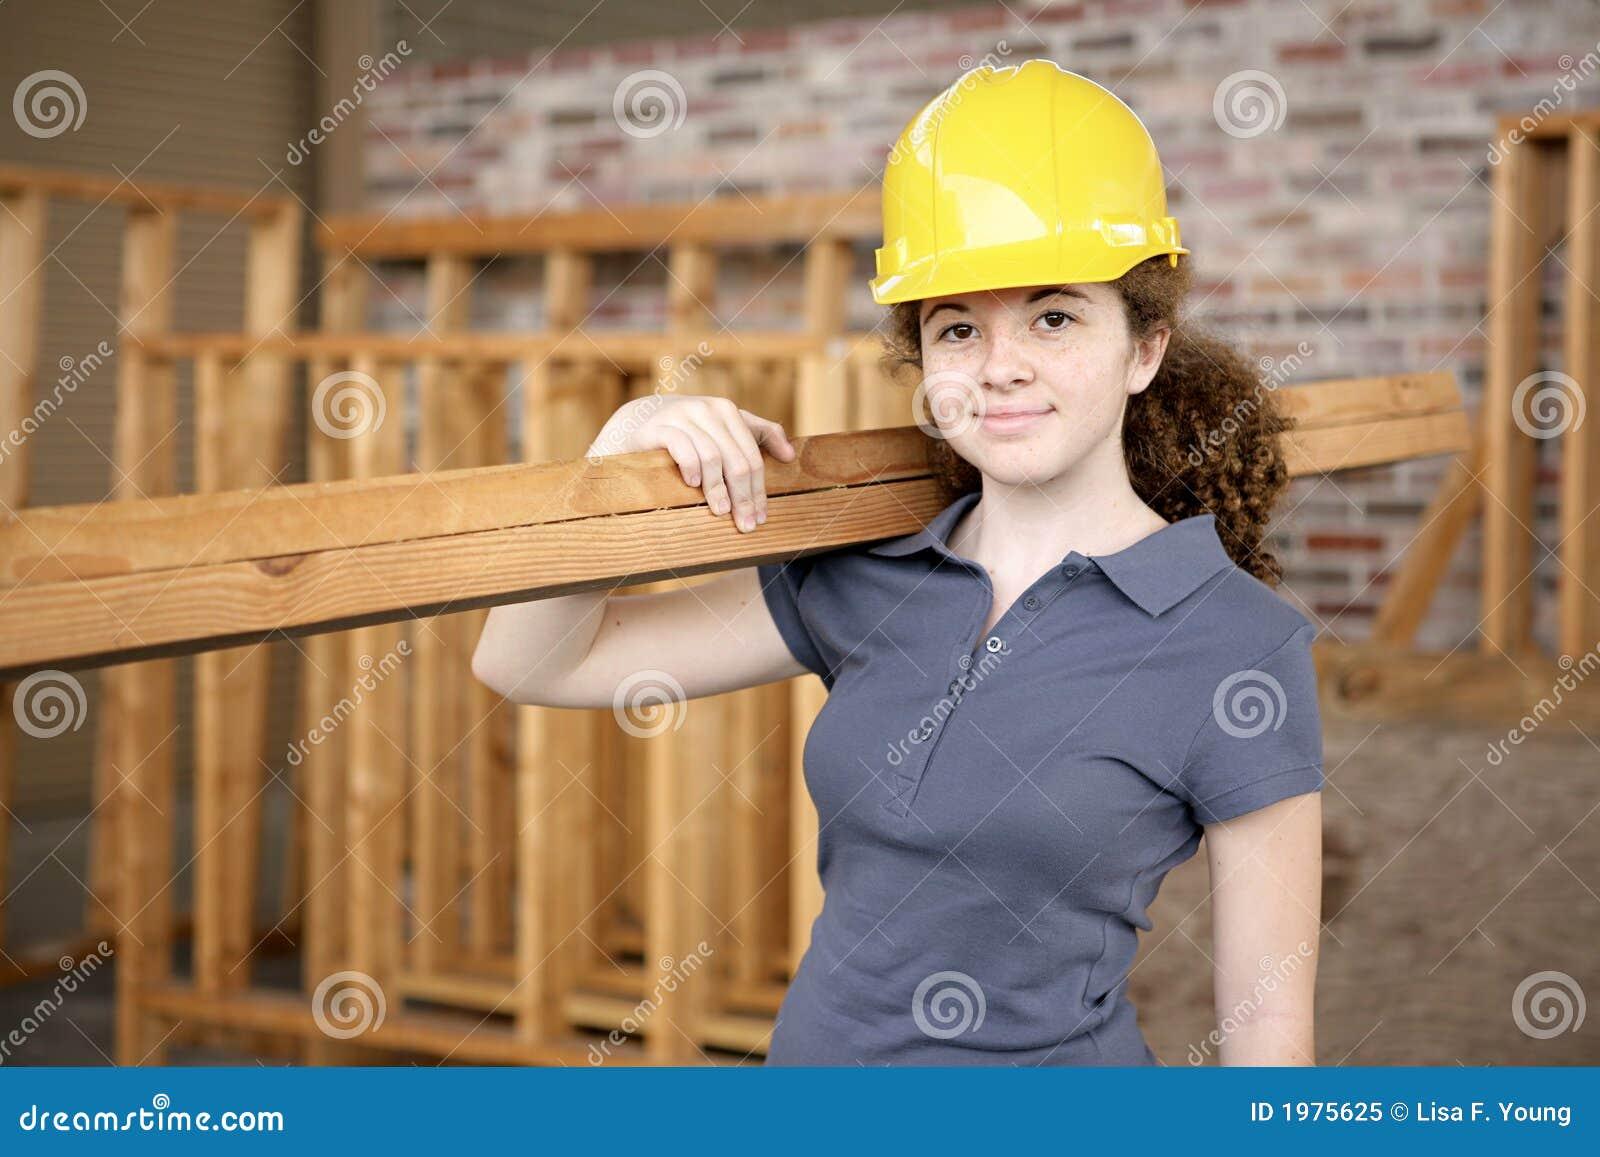 Female Construction Apprentice